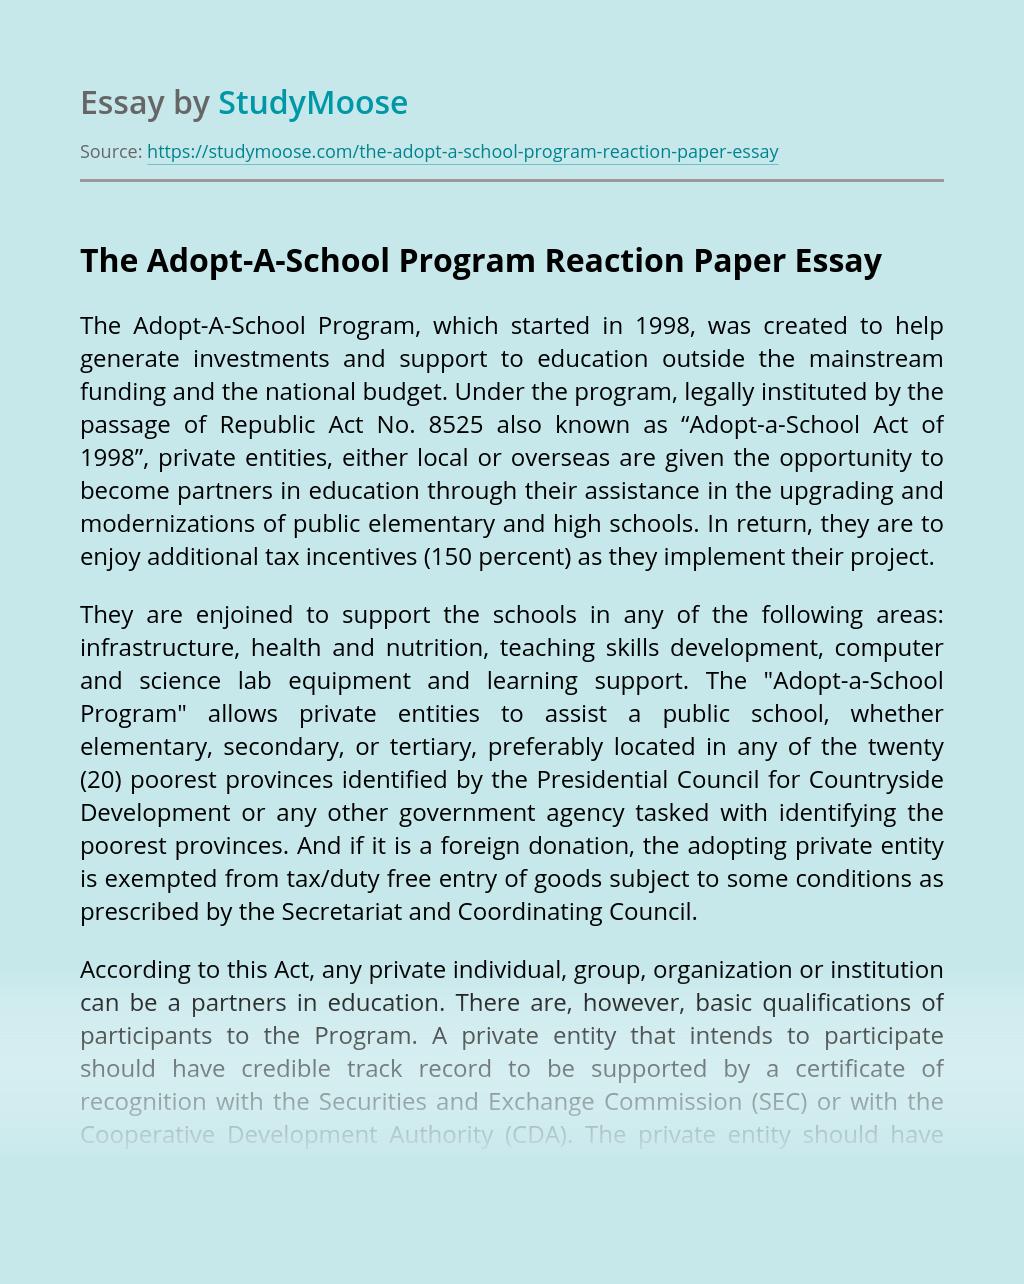 The Adopt-A-School Program Reaction Paper